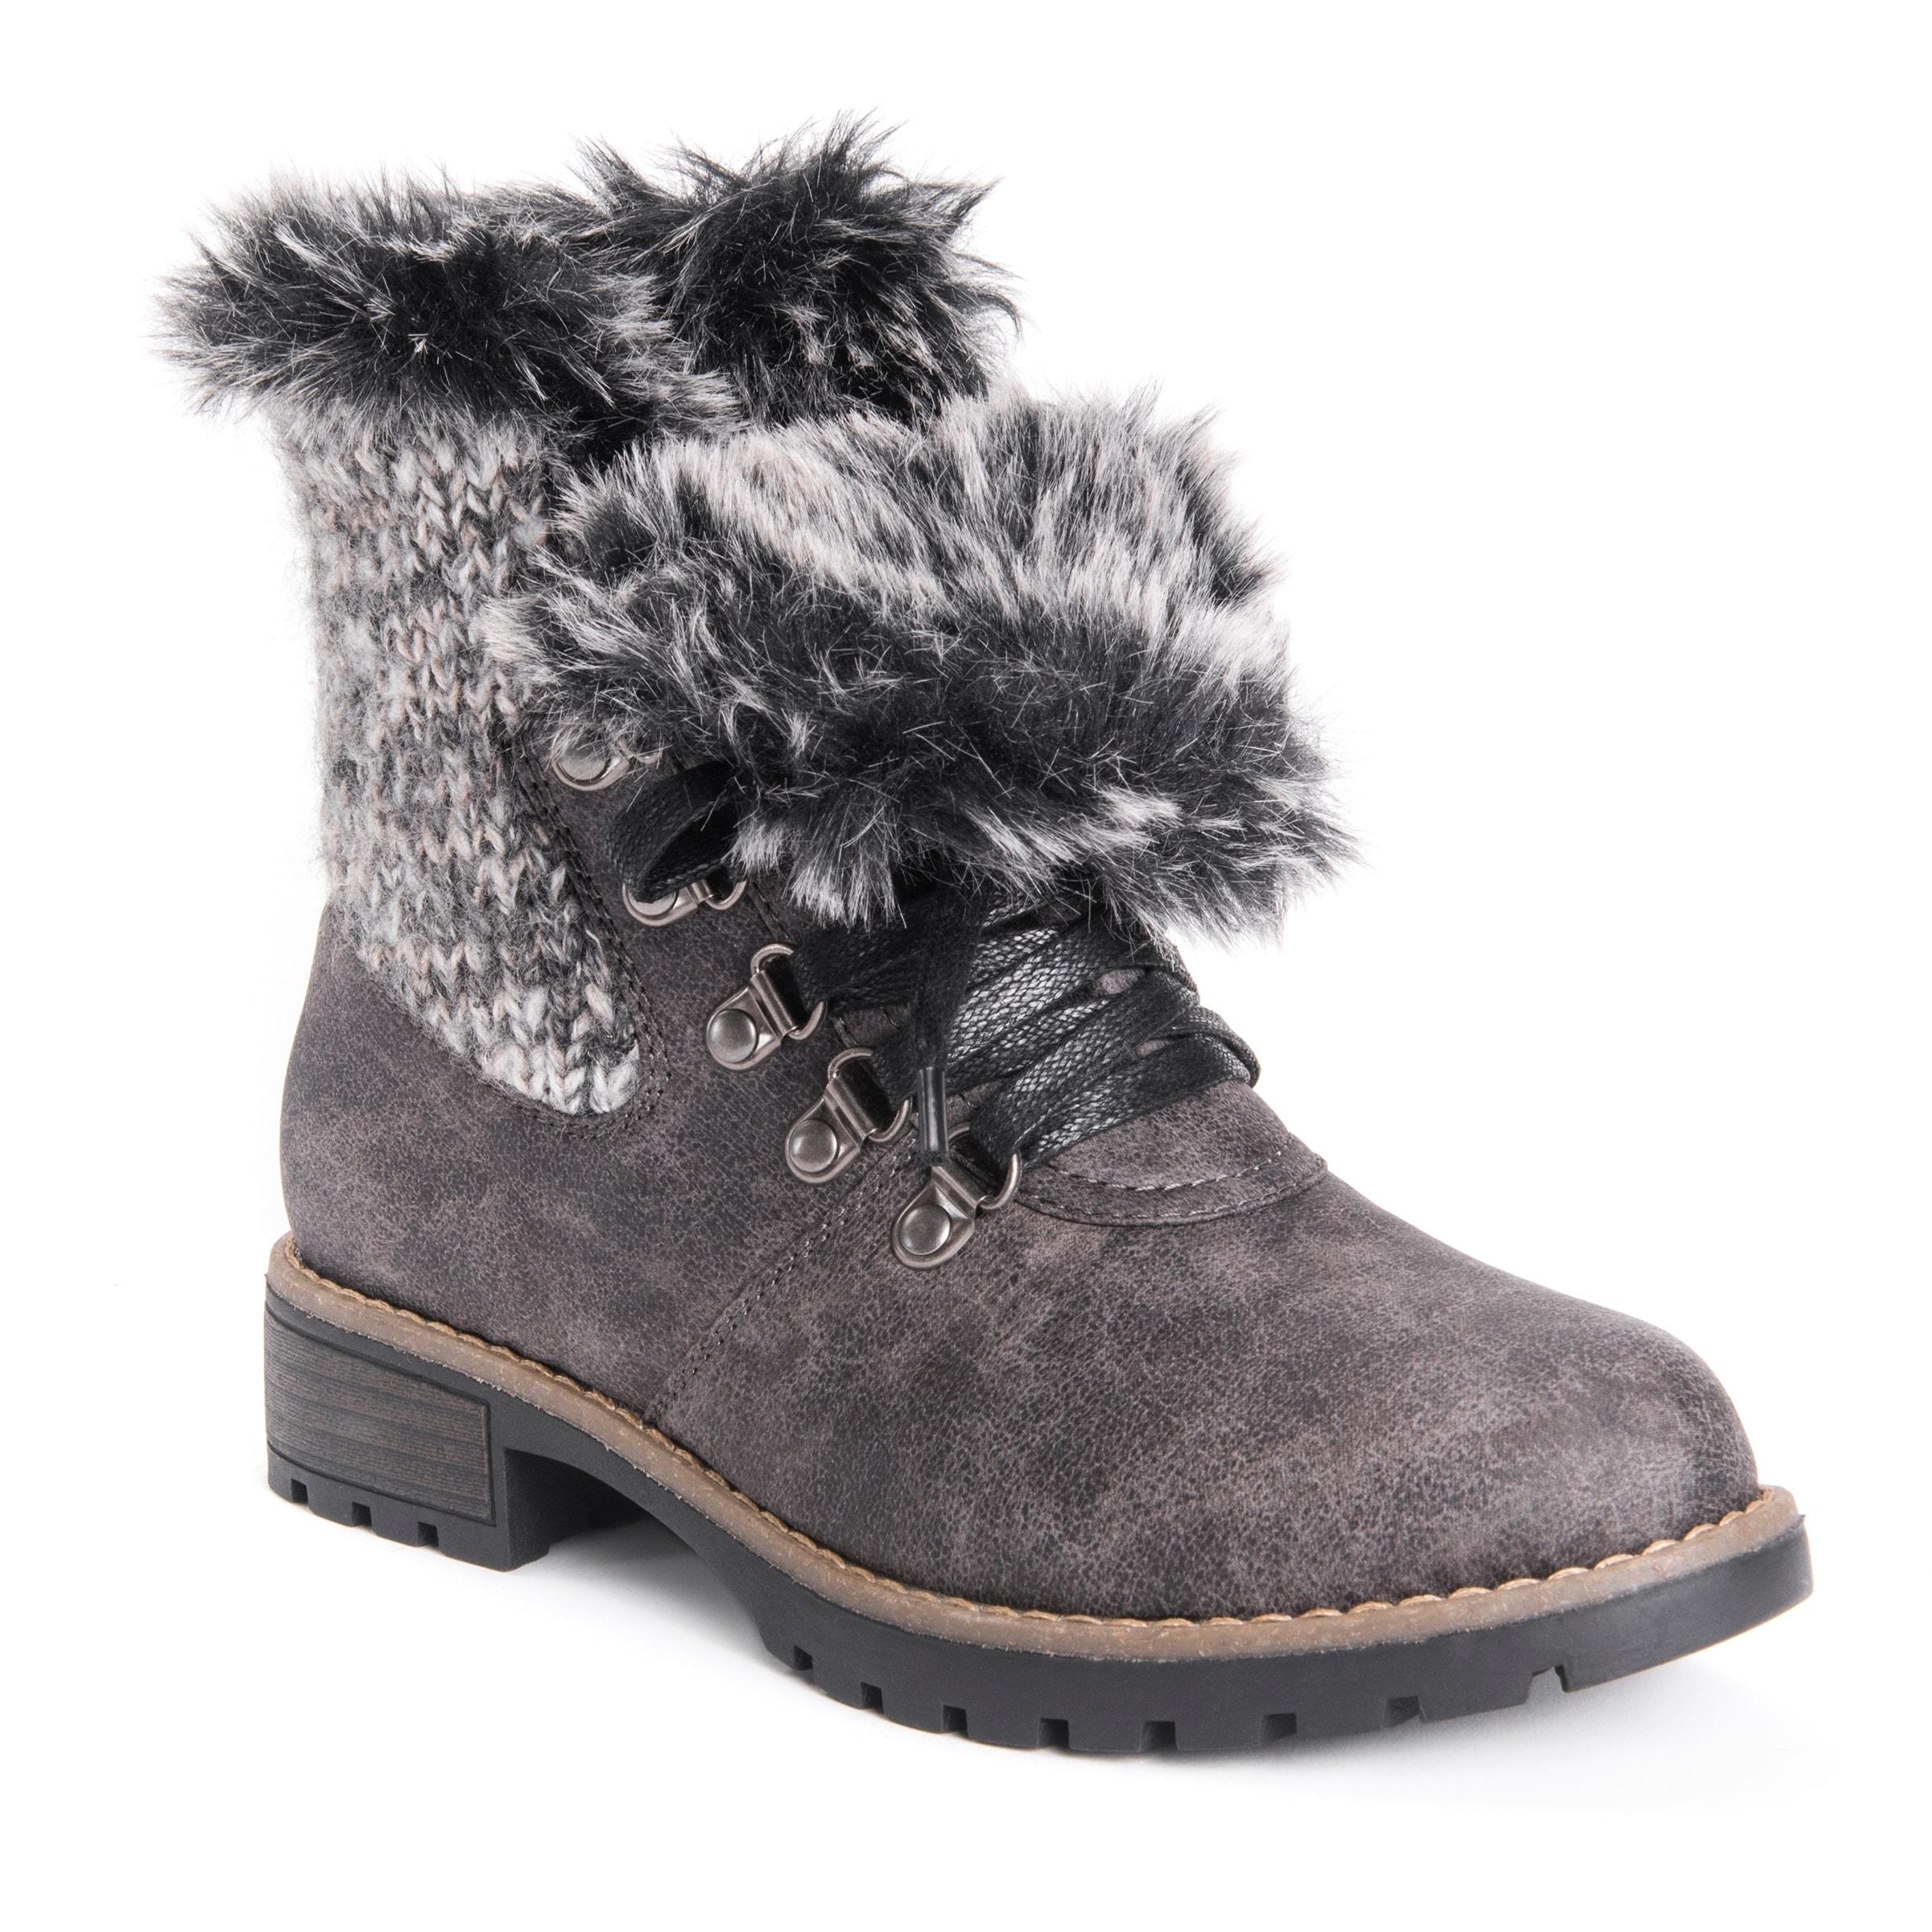 MUK LUKS® Women's Verna Boots - On Sale